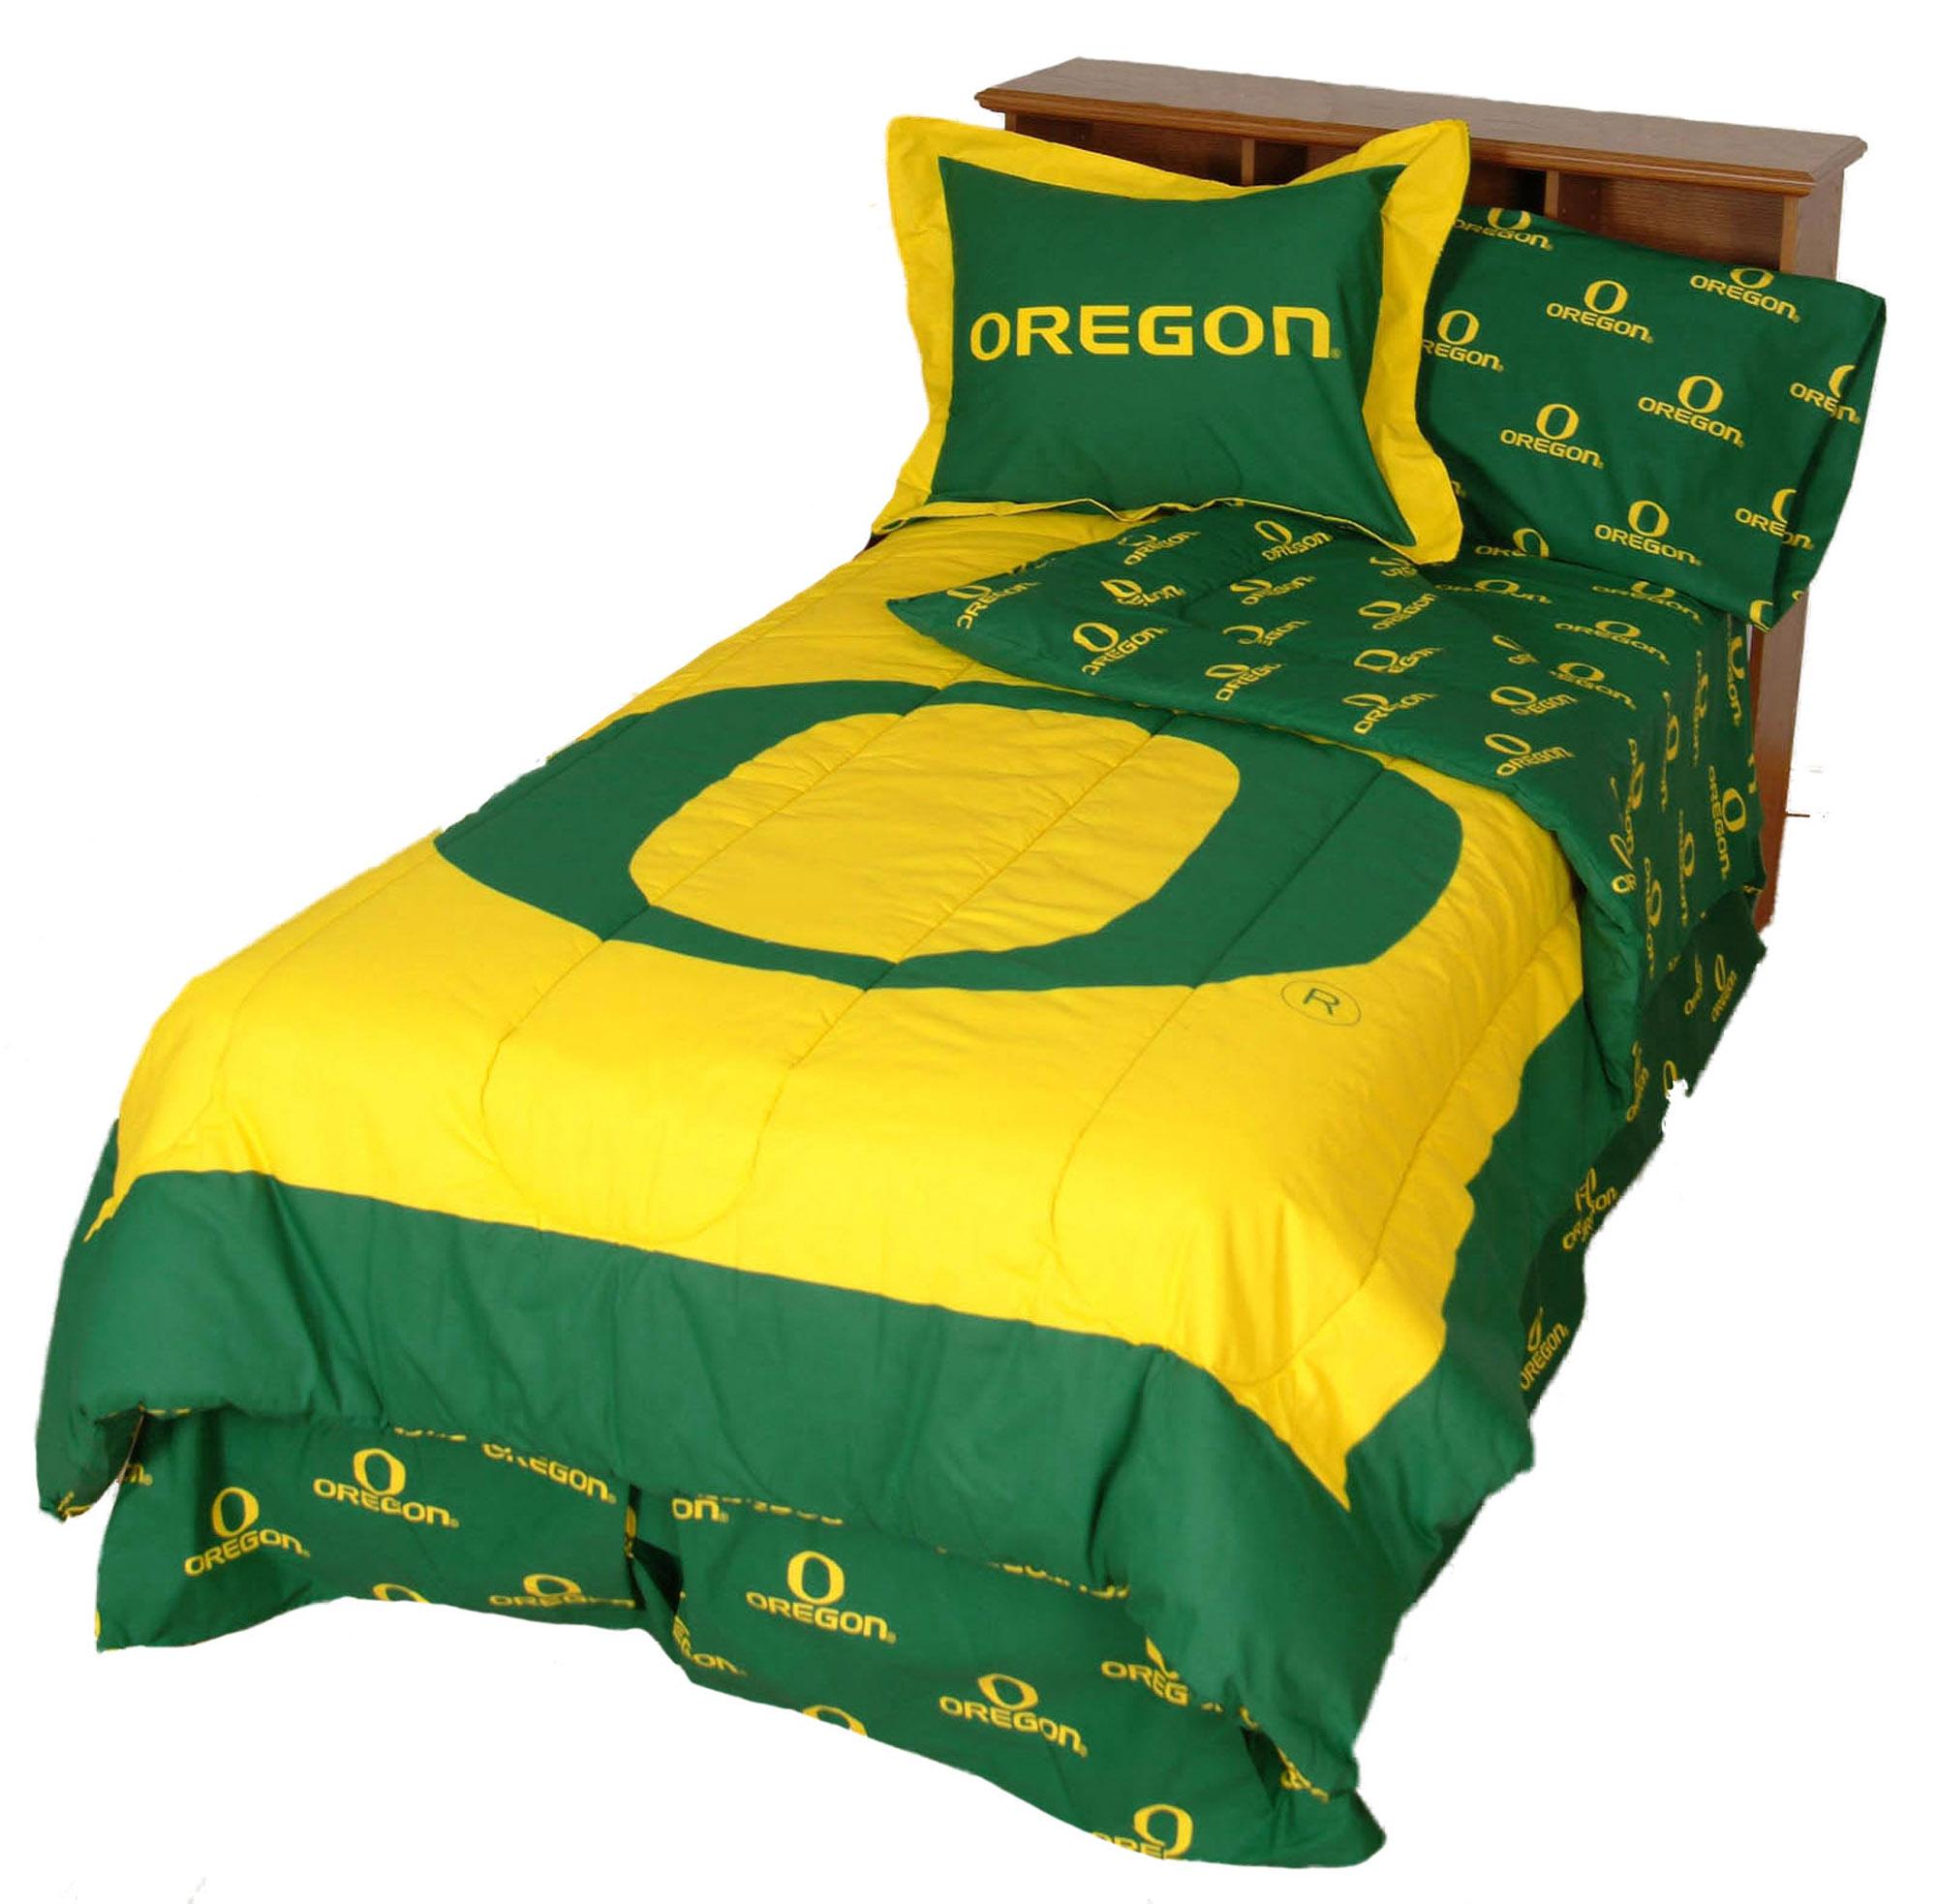 Oregon Ducks 2 Pc Comforter Set, 1 Comforter, 1 Sham, Twin